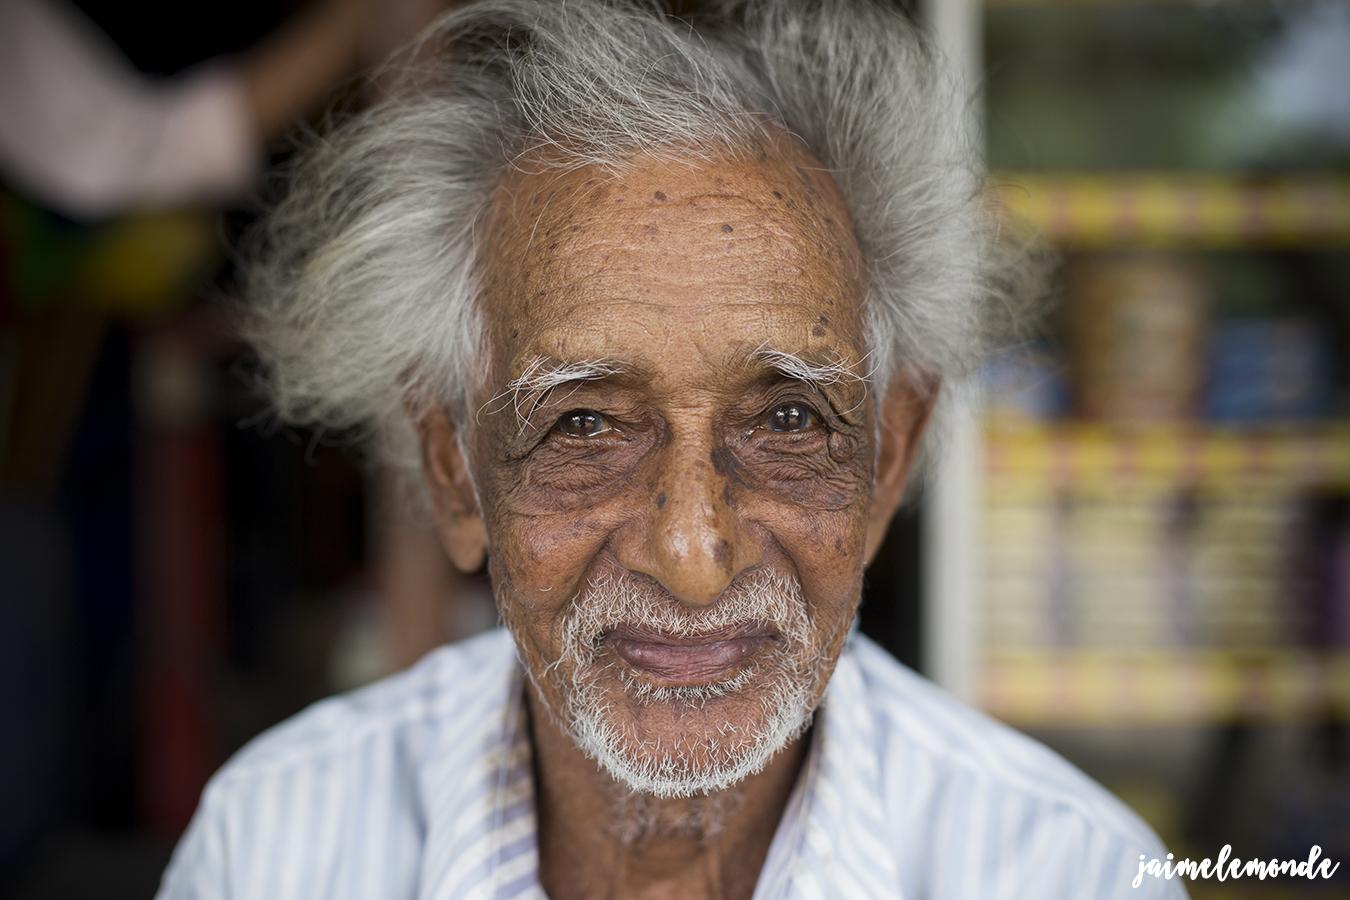 Portraits de voyage au Sri Lanka ©jaimelemonde (13)